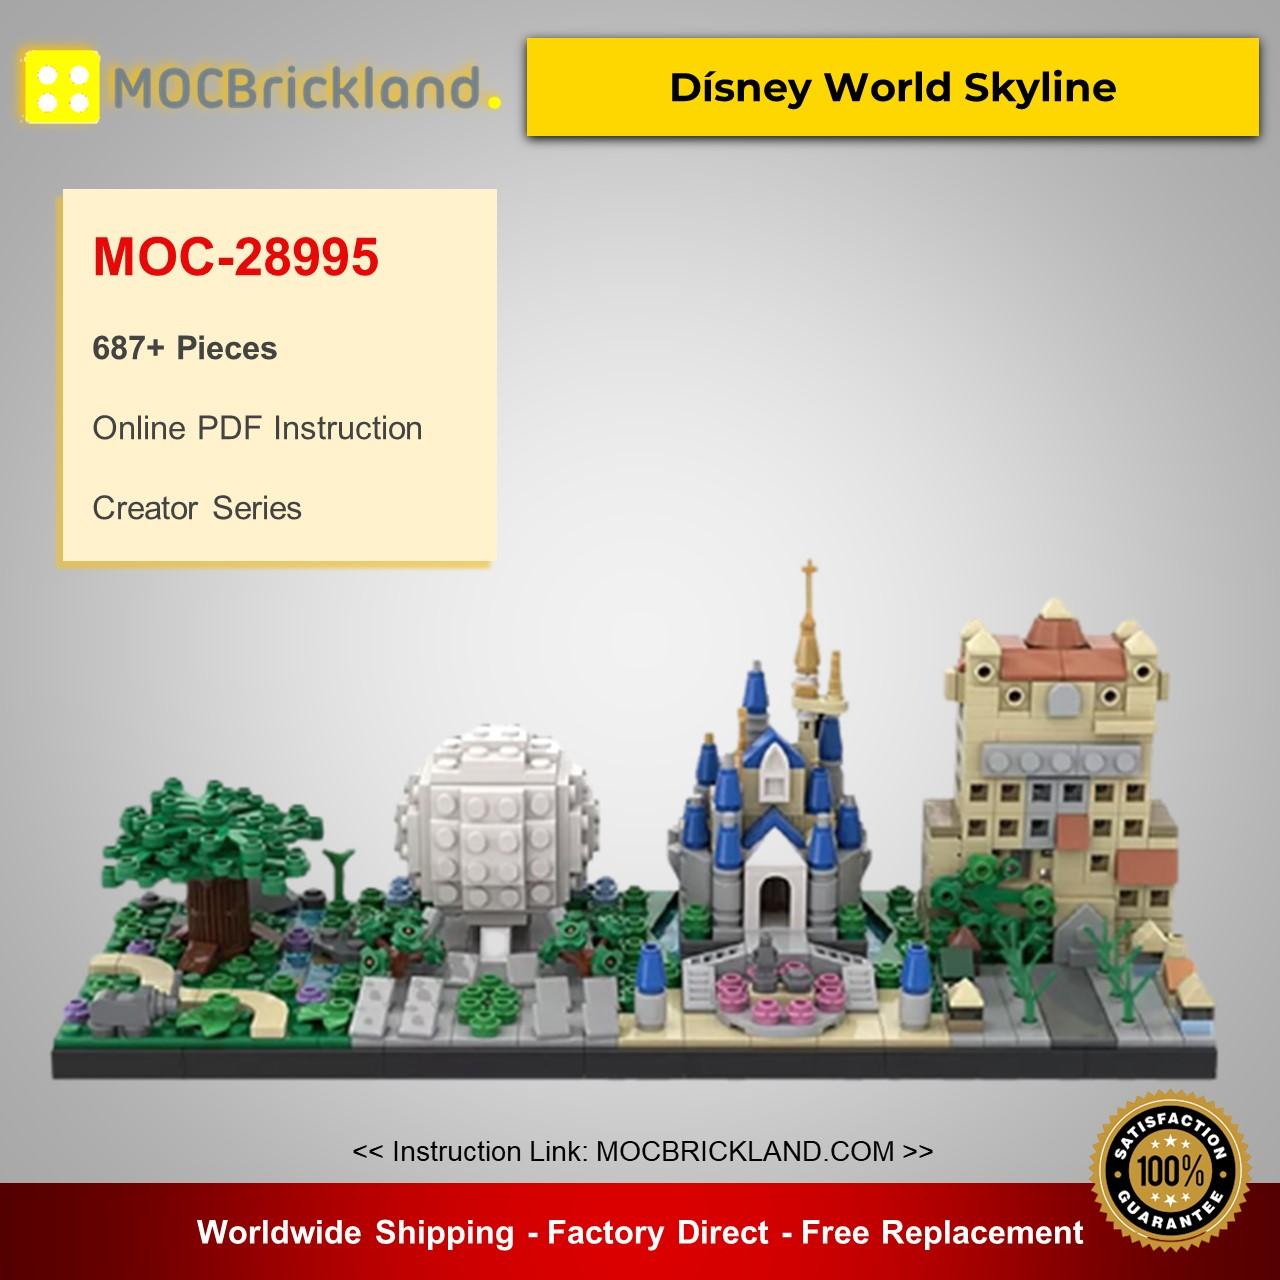 MOC-28995 Creator Dísney World Skyline Designed By benbuildslego With 687 Pieces